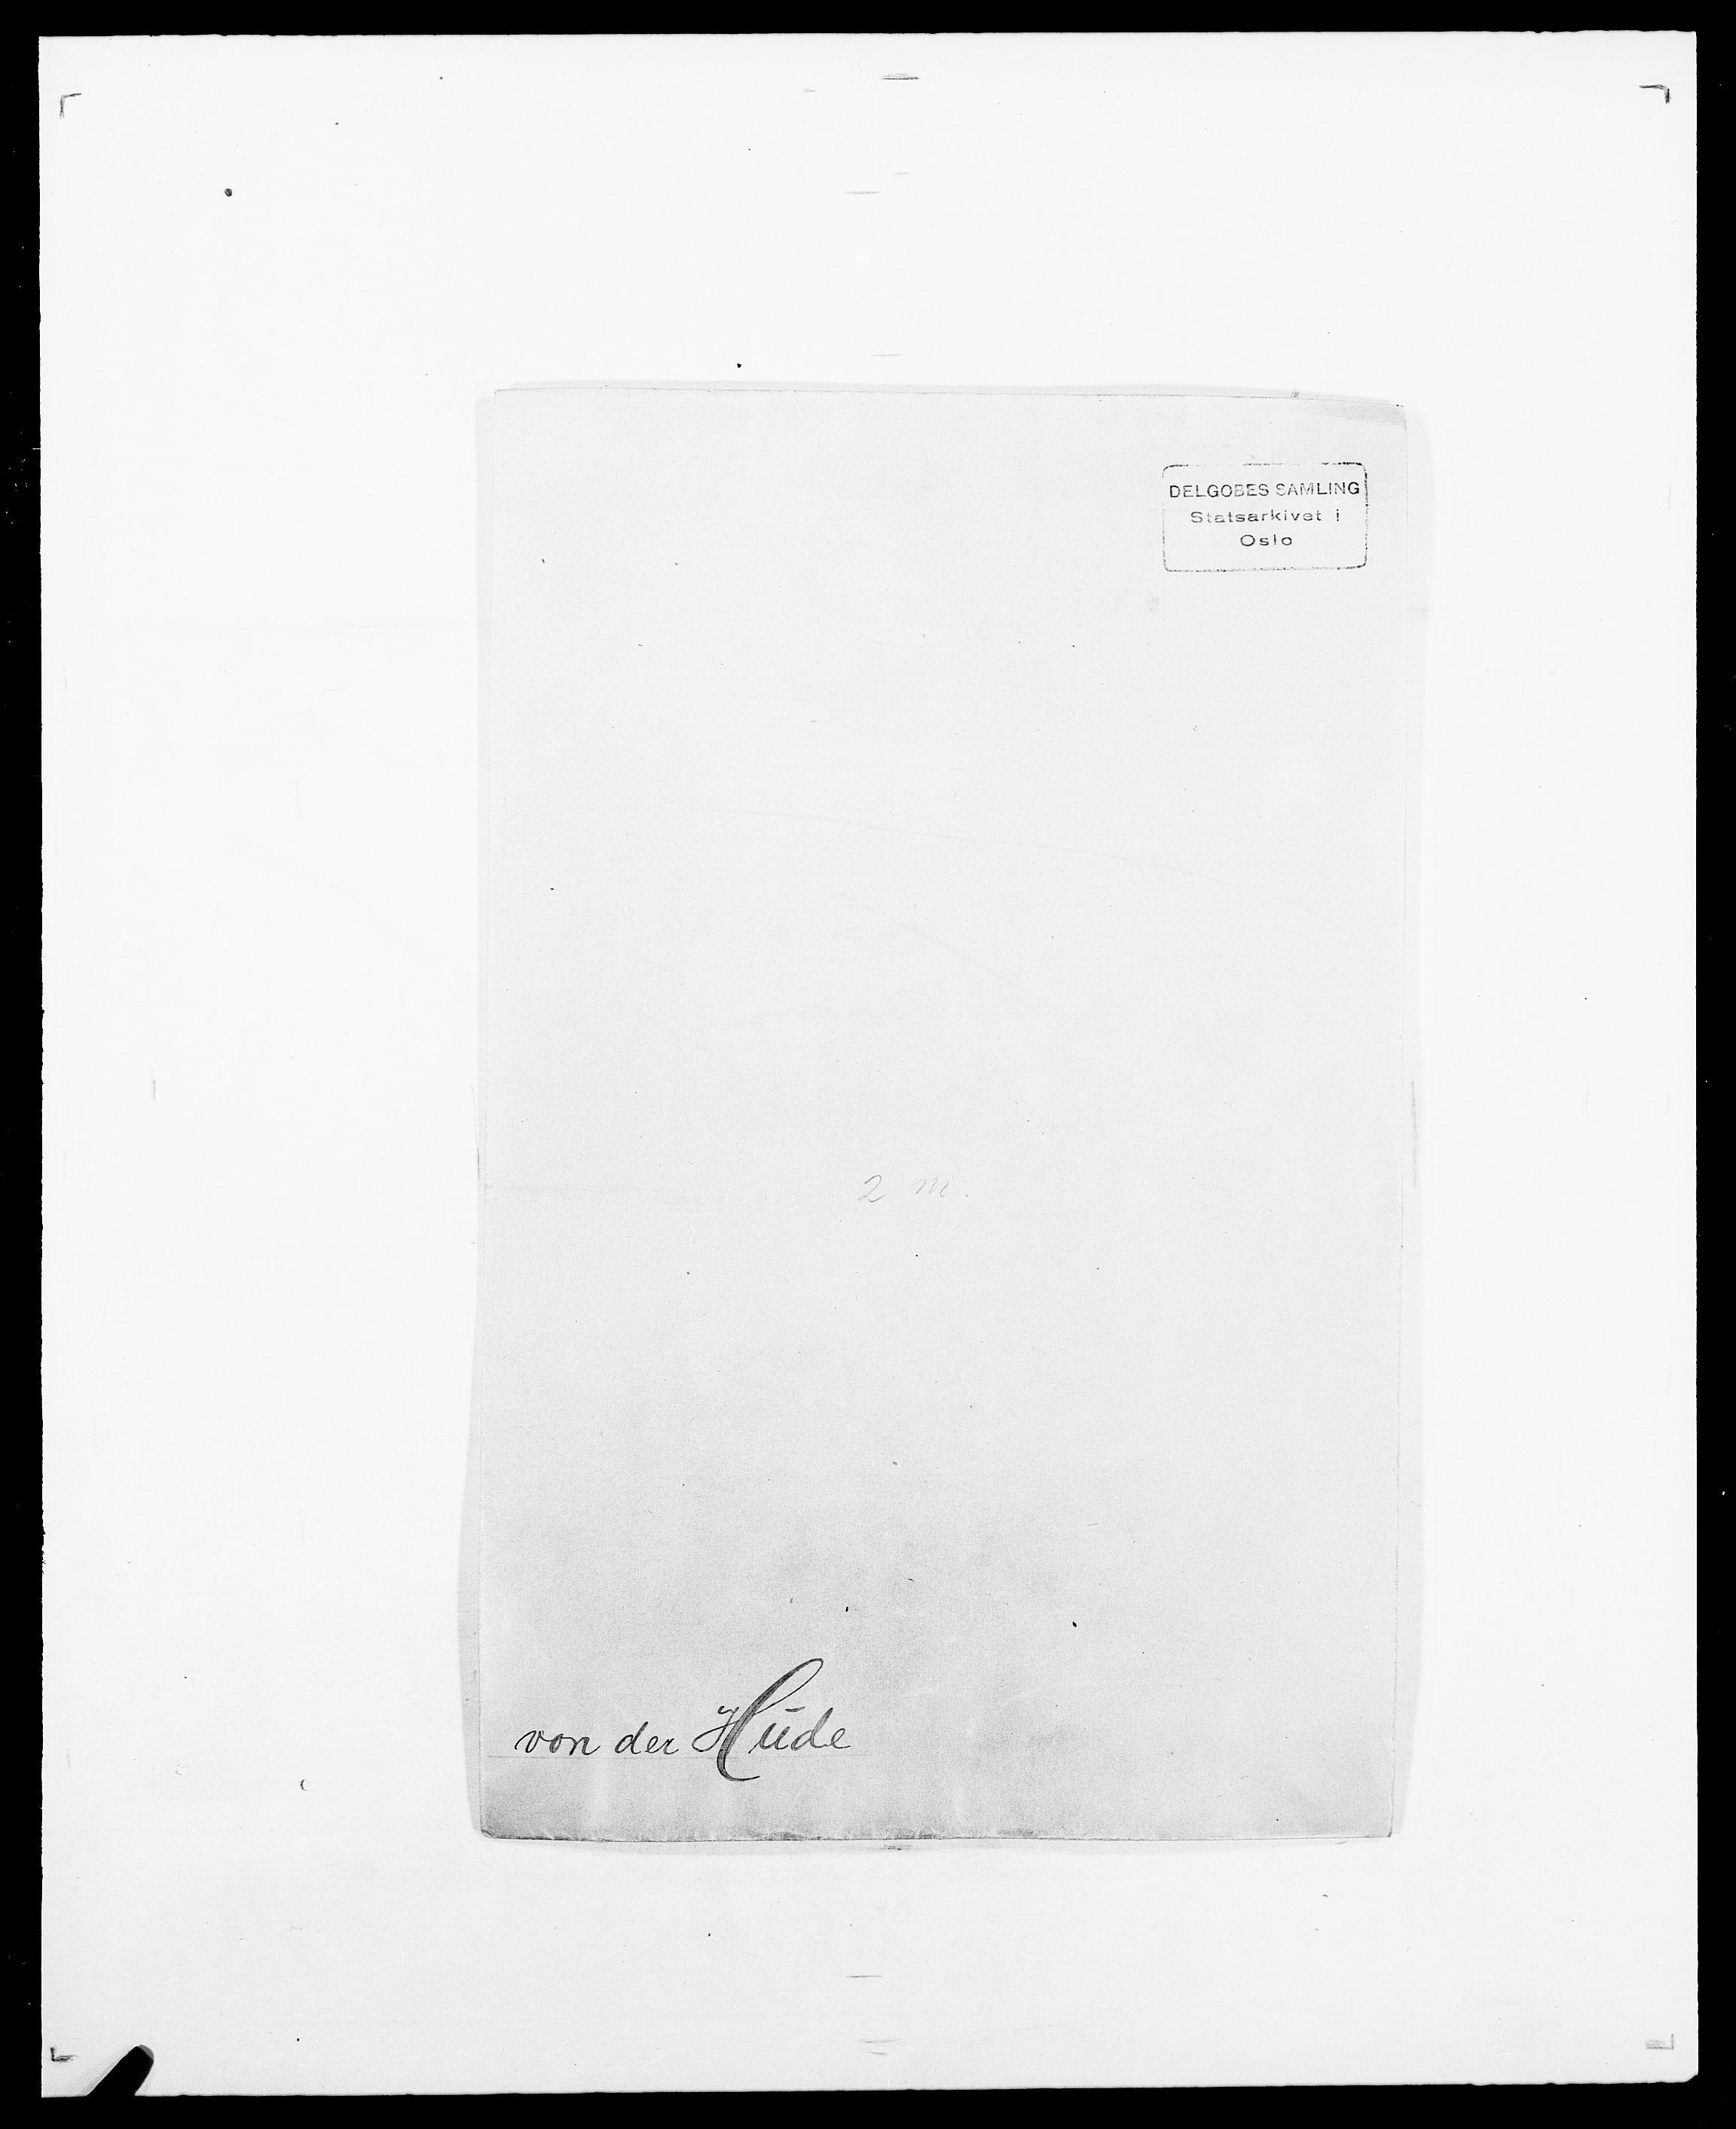 SAO, Delgobe, Charles Antoine - samling, D/Da/L0019: van der Hude - Joys, s. 1